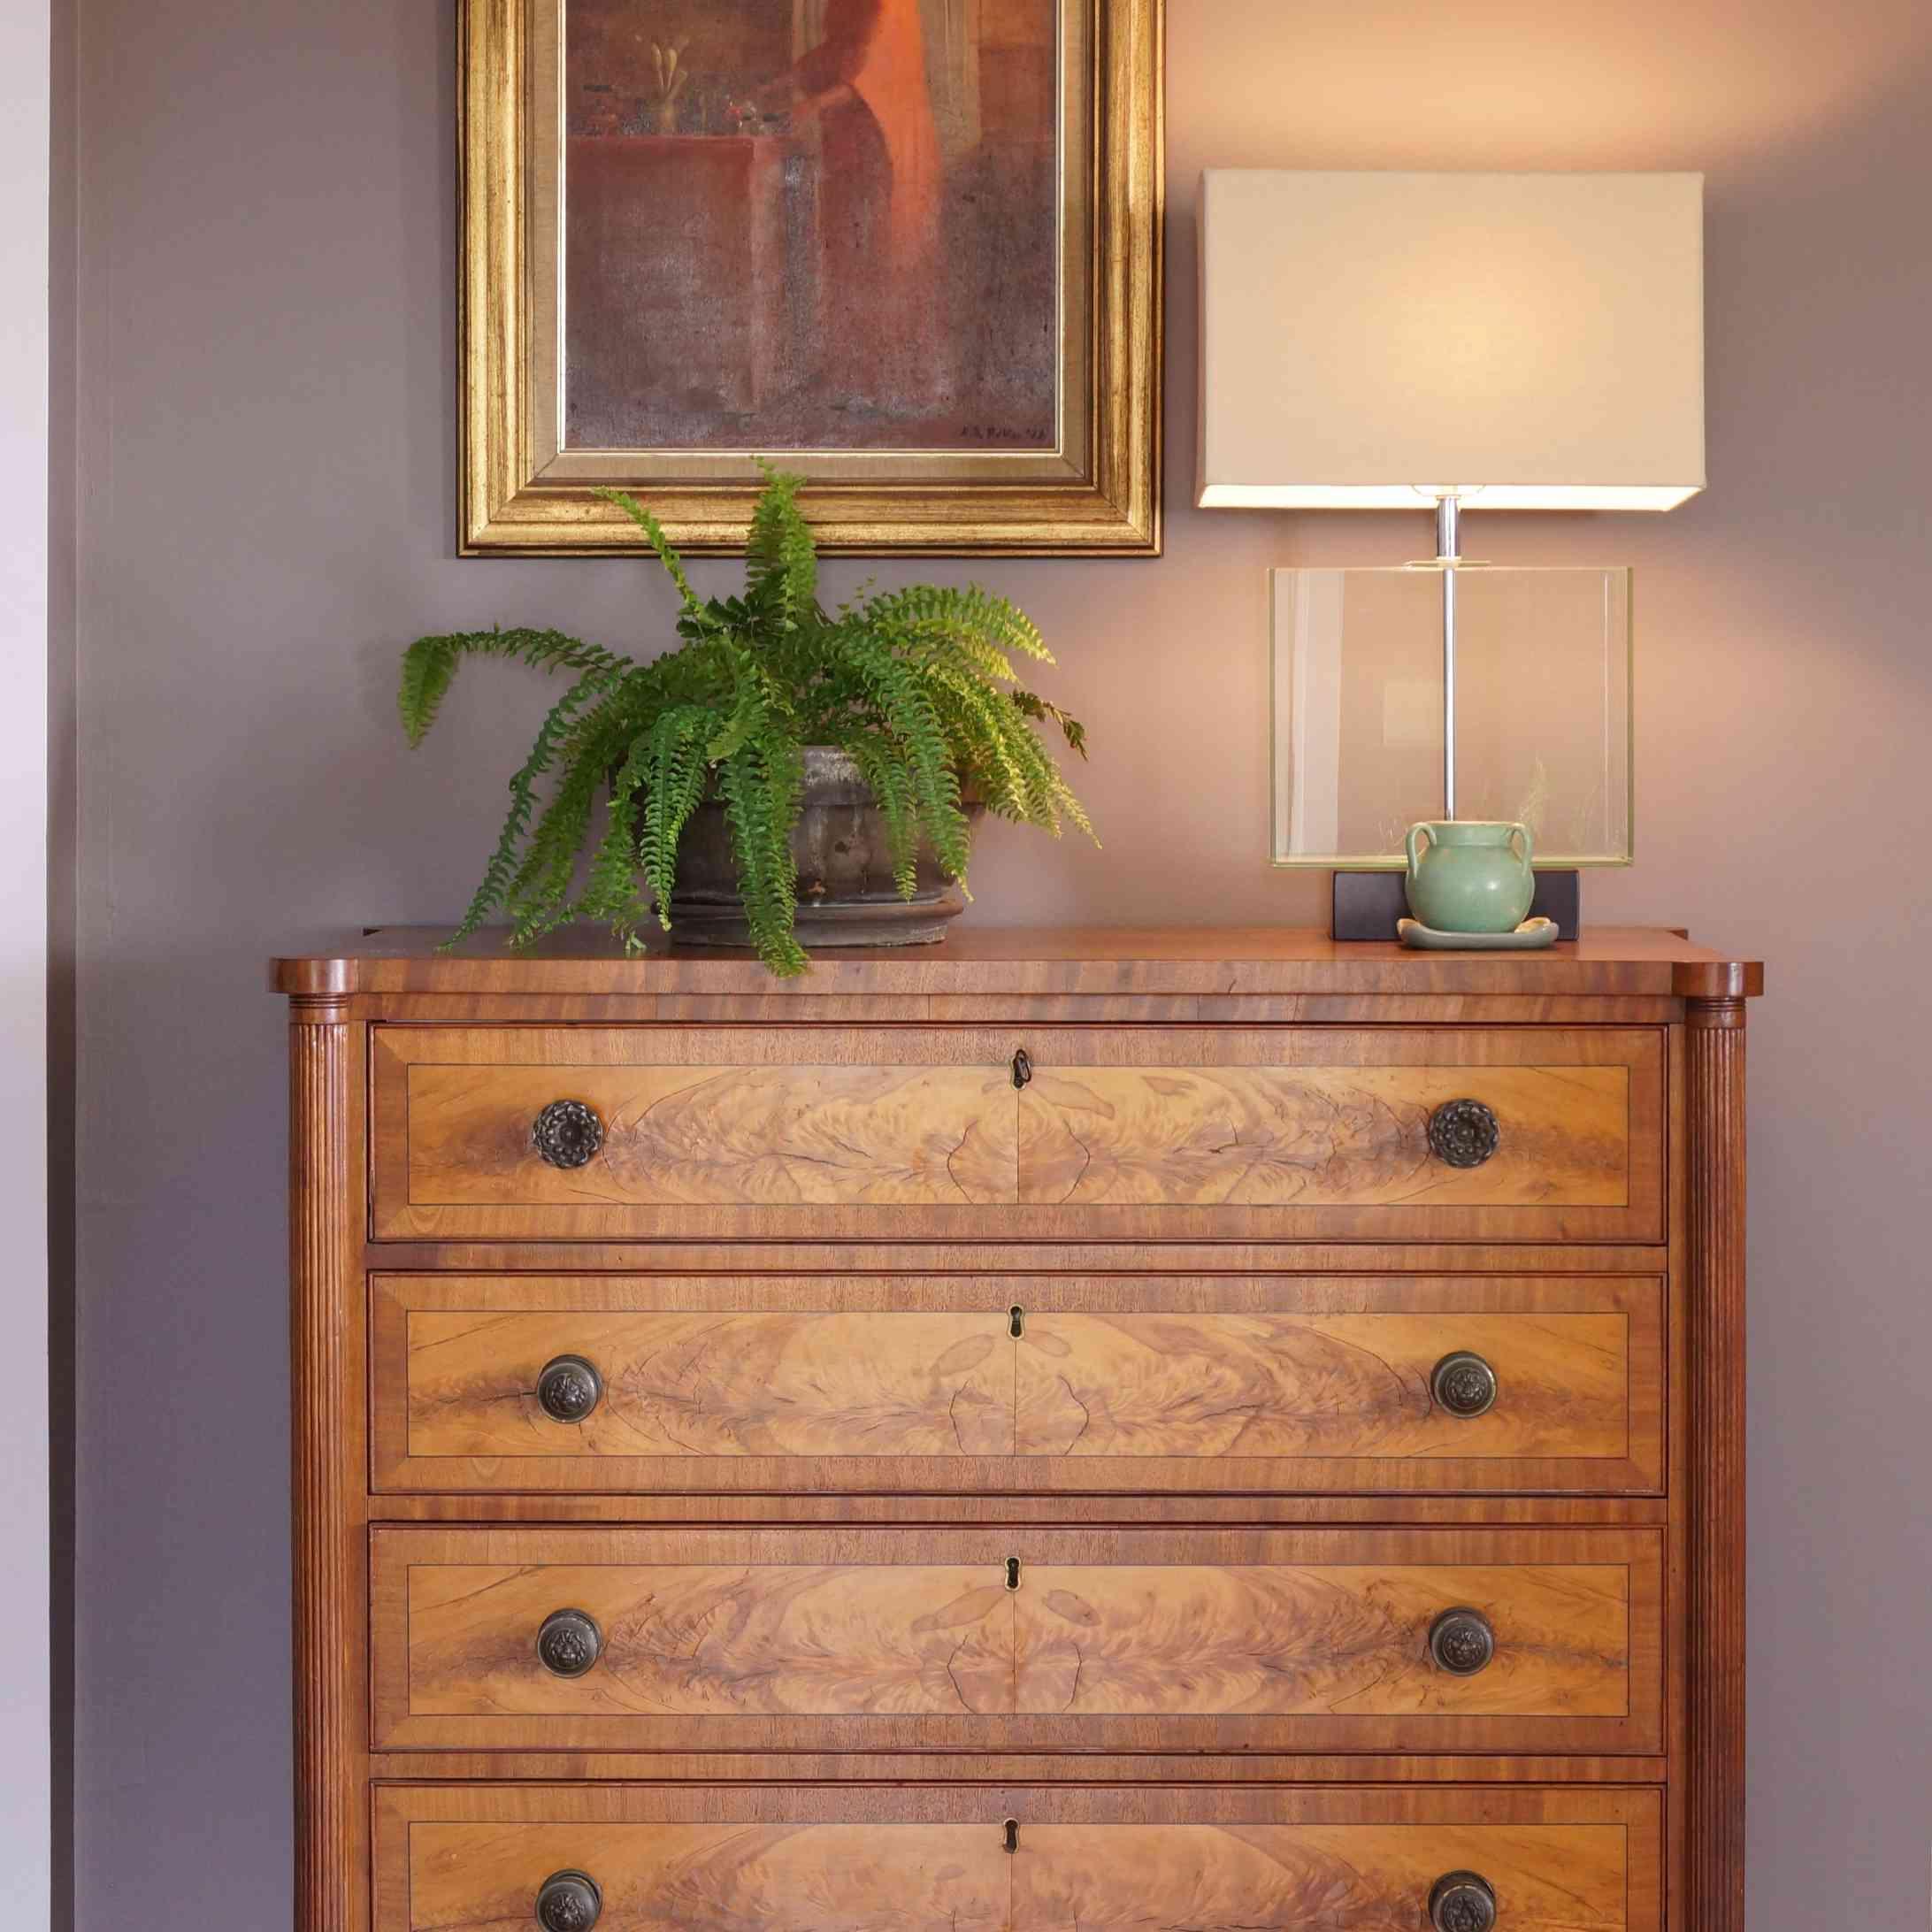 Dresser with art work above it